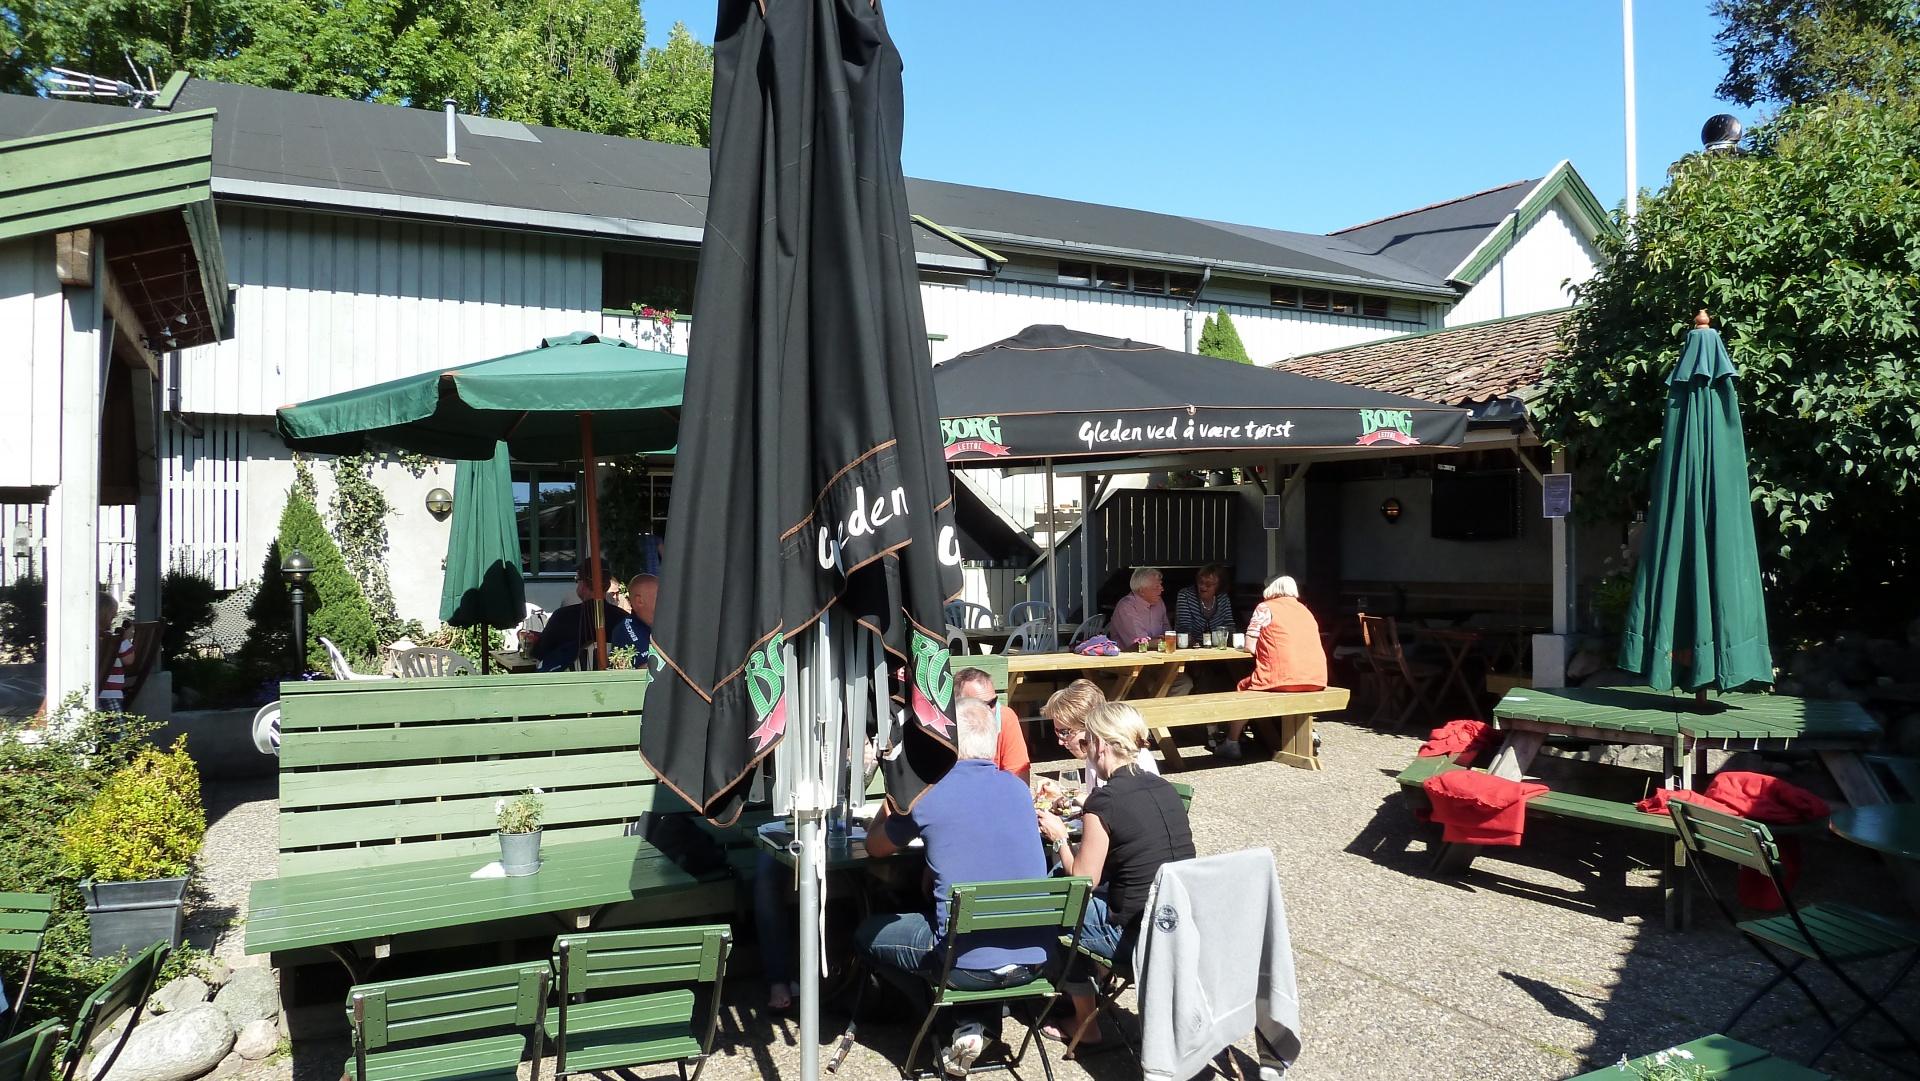 Café Oline, Nedgården på Søndre Sandøy, Hvaler juli 2010